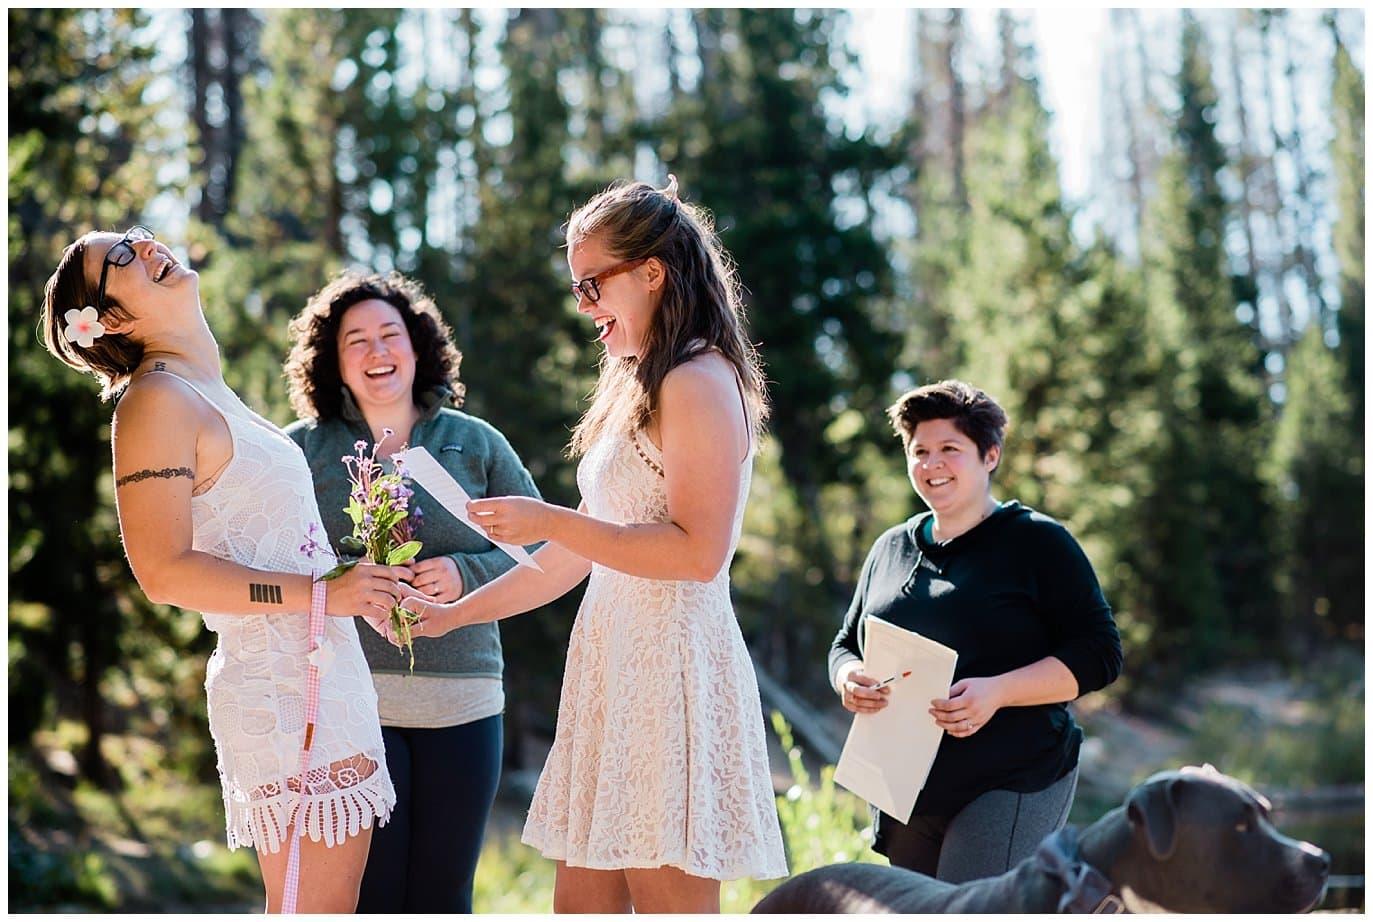 vows at sunrise Breckenridge elopement photo